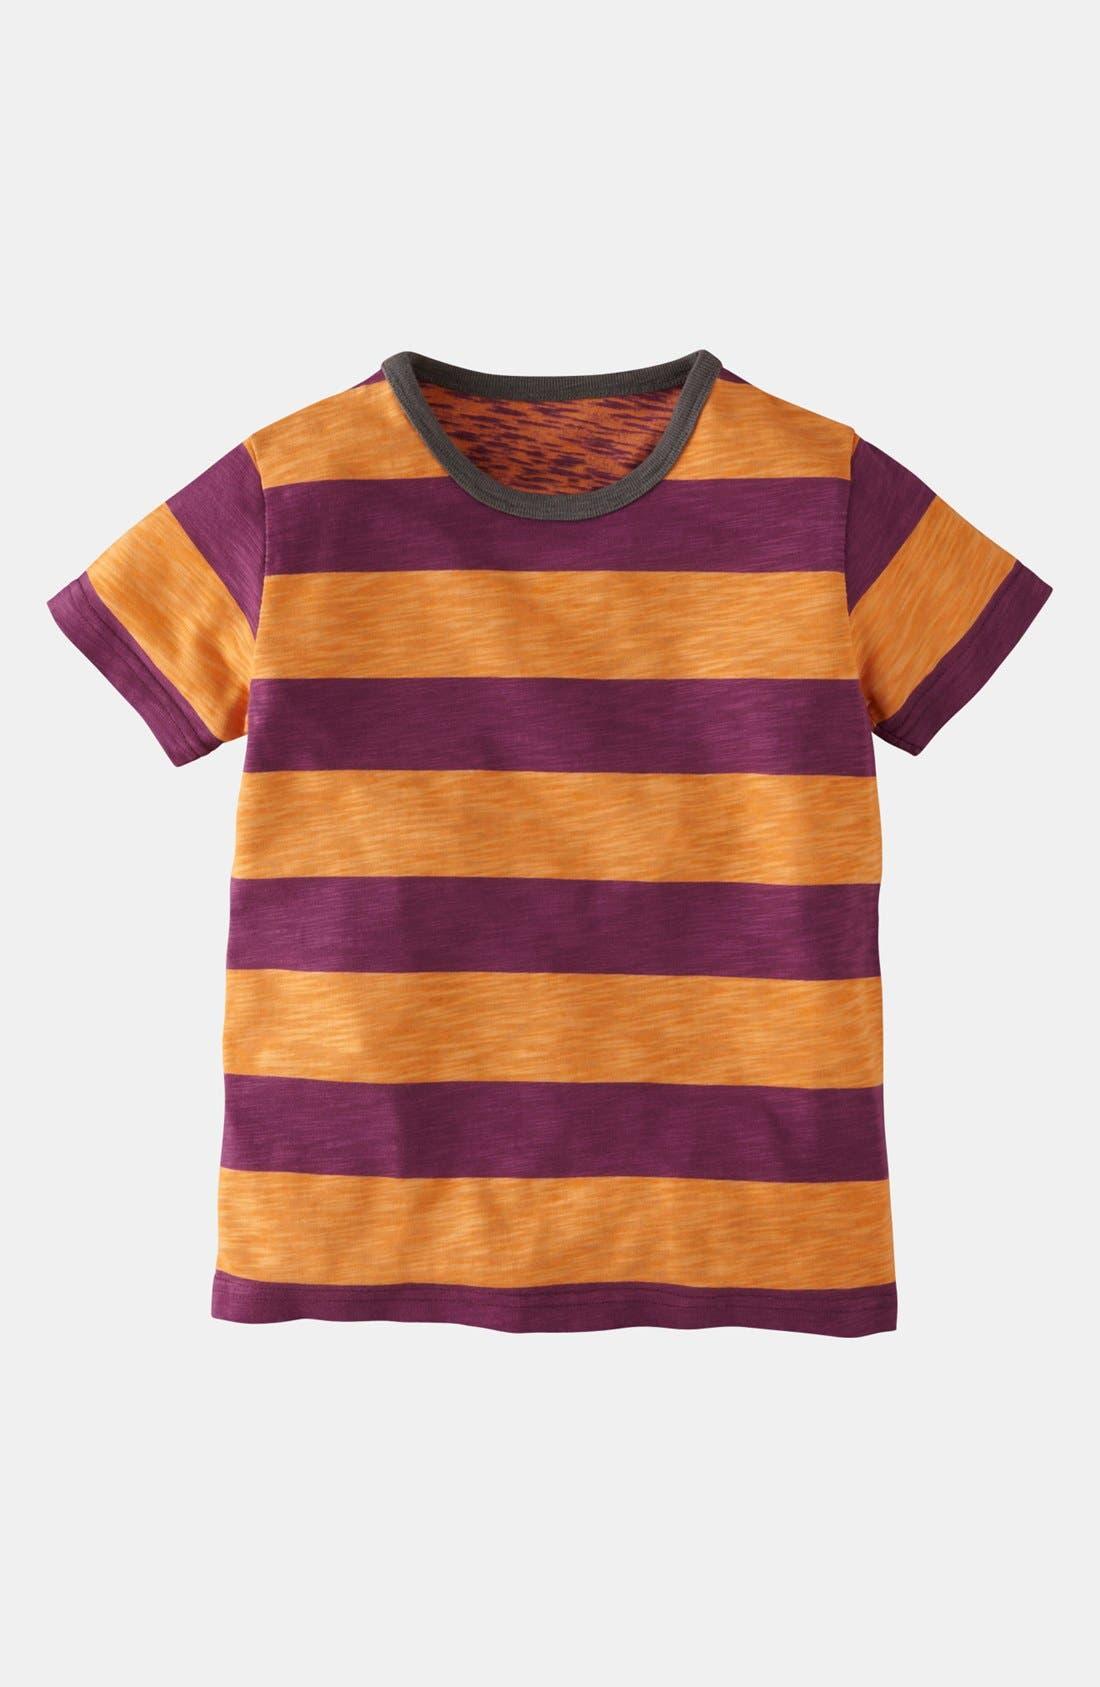 Main Image - Mini Boden 'Stripy' T-Shirt (Little Boys & Big Boys)